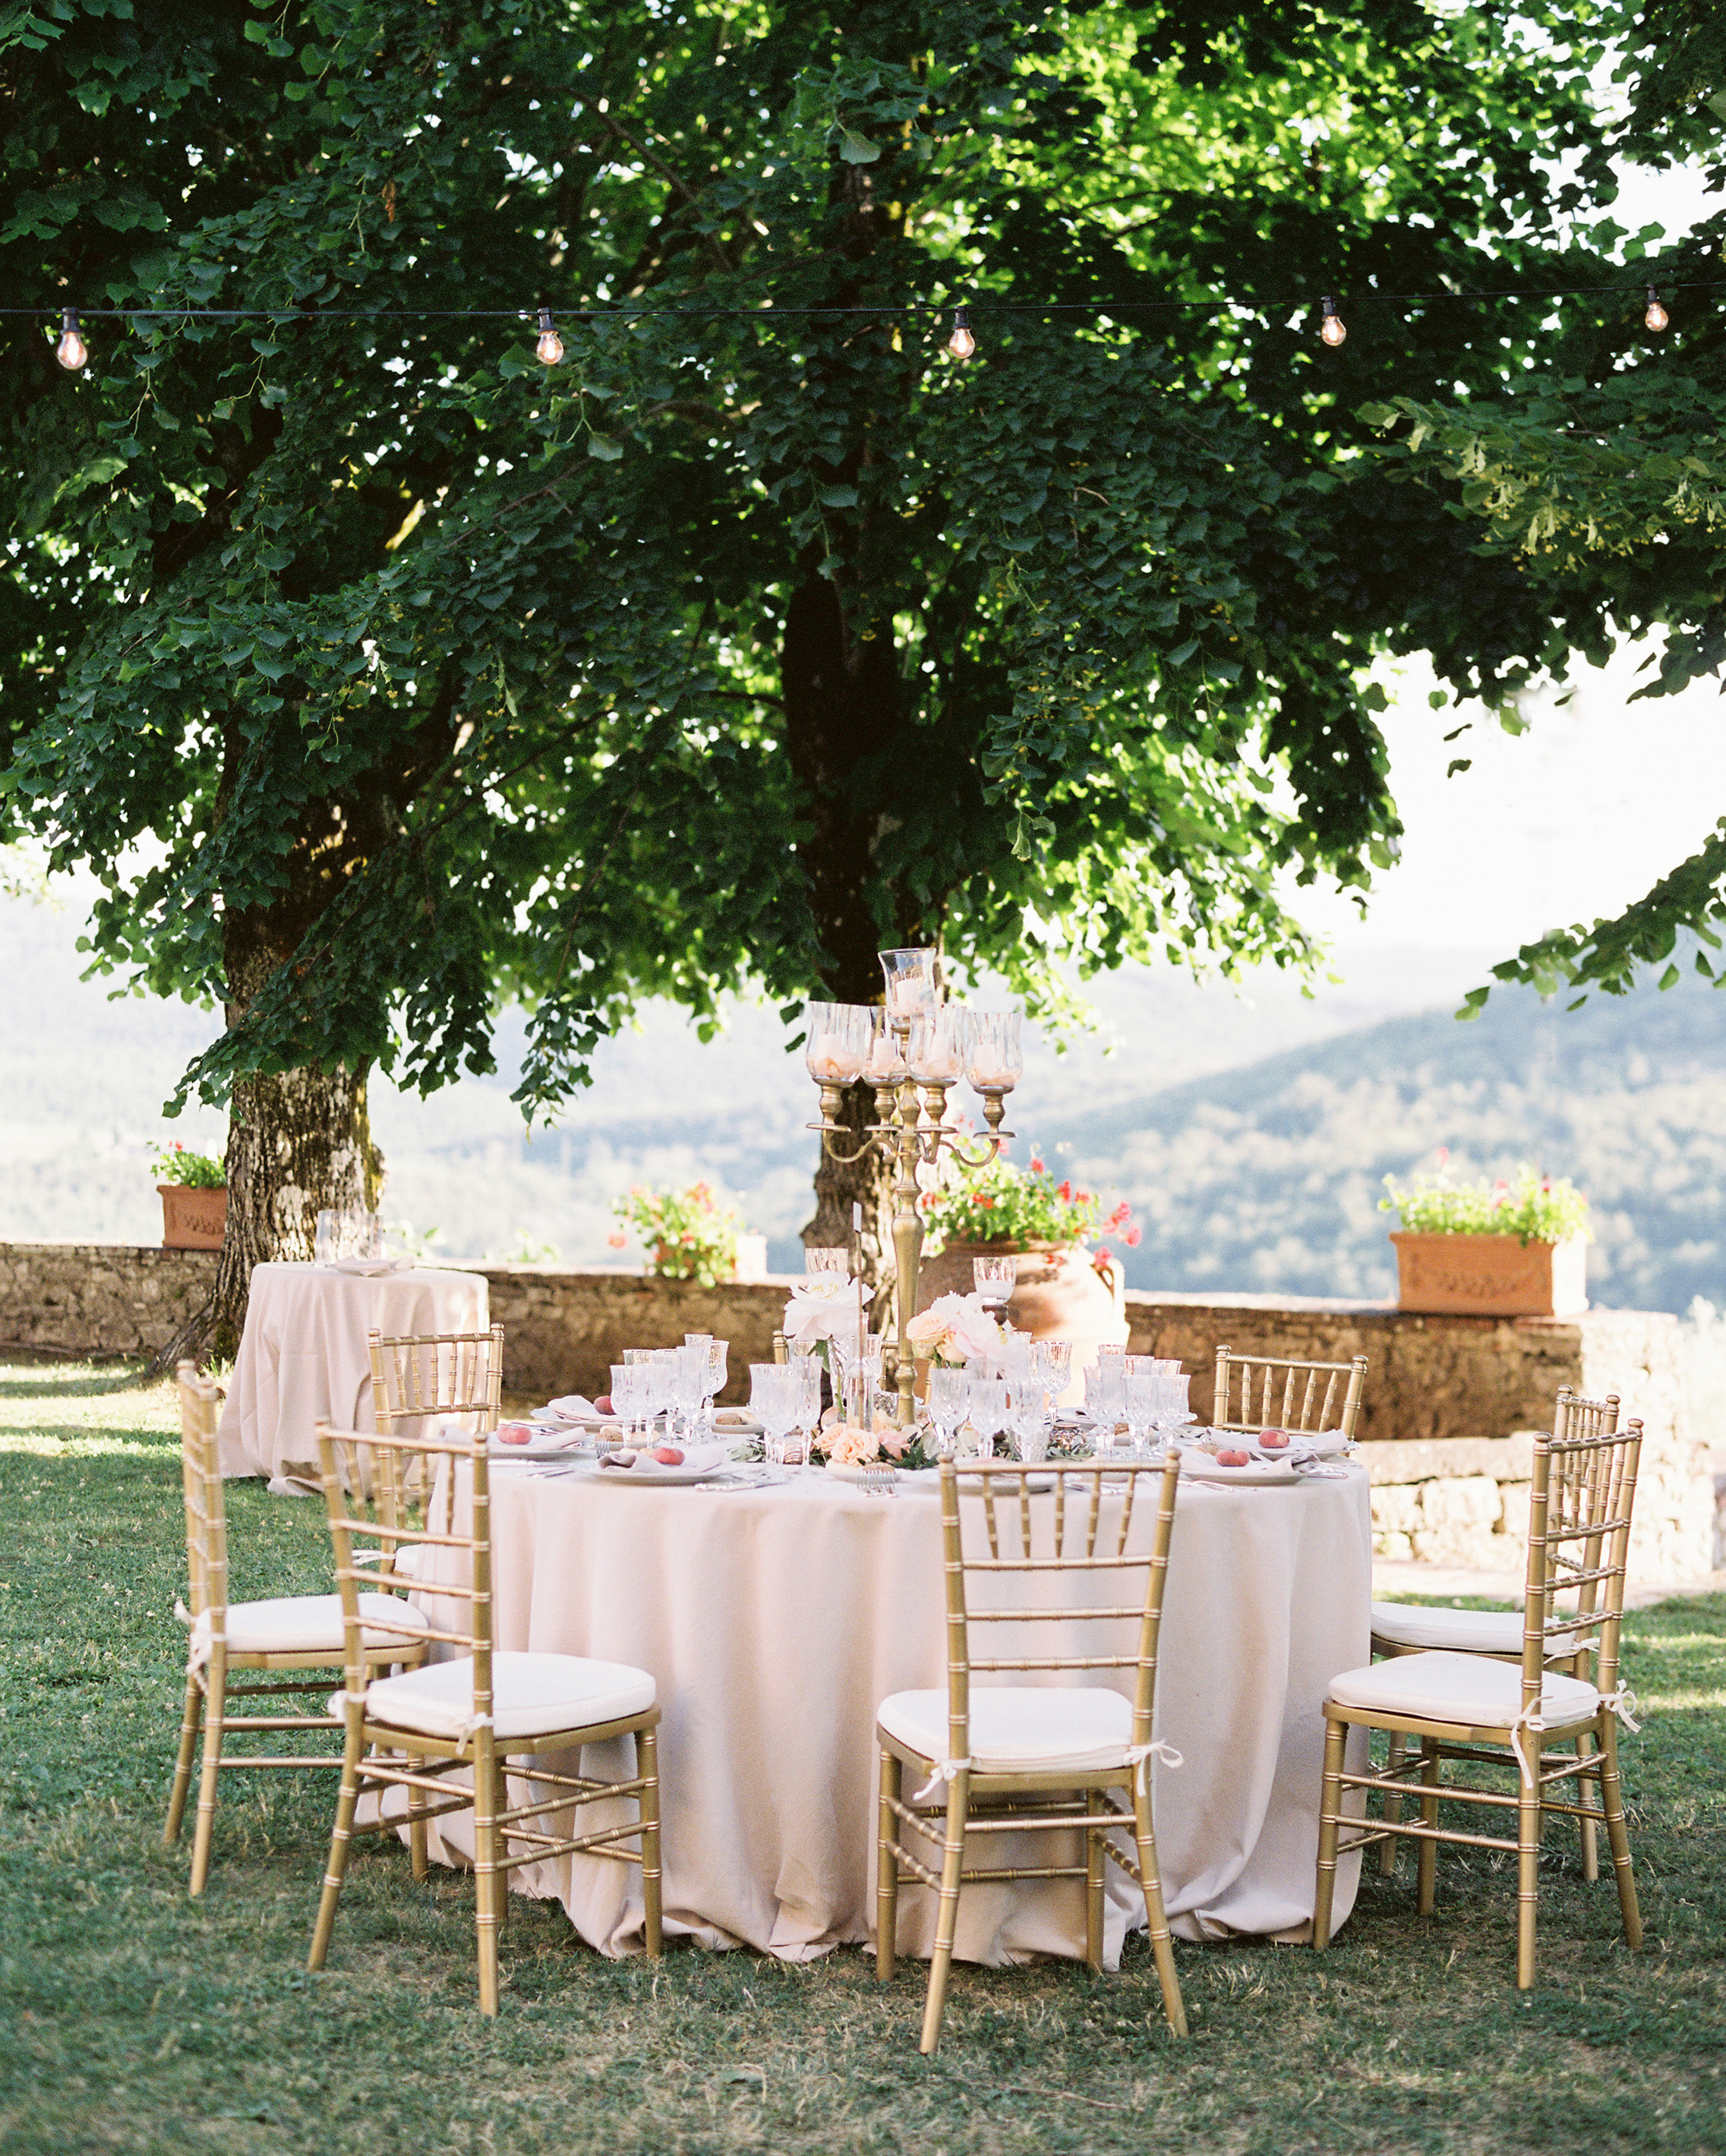 lauren-ollie-wedding-table-147-s111895-0515.jpg